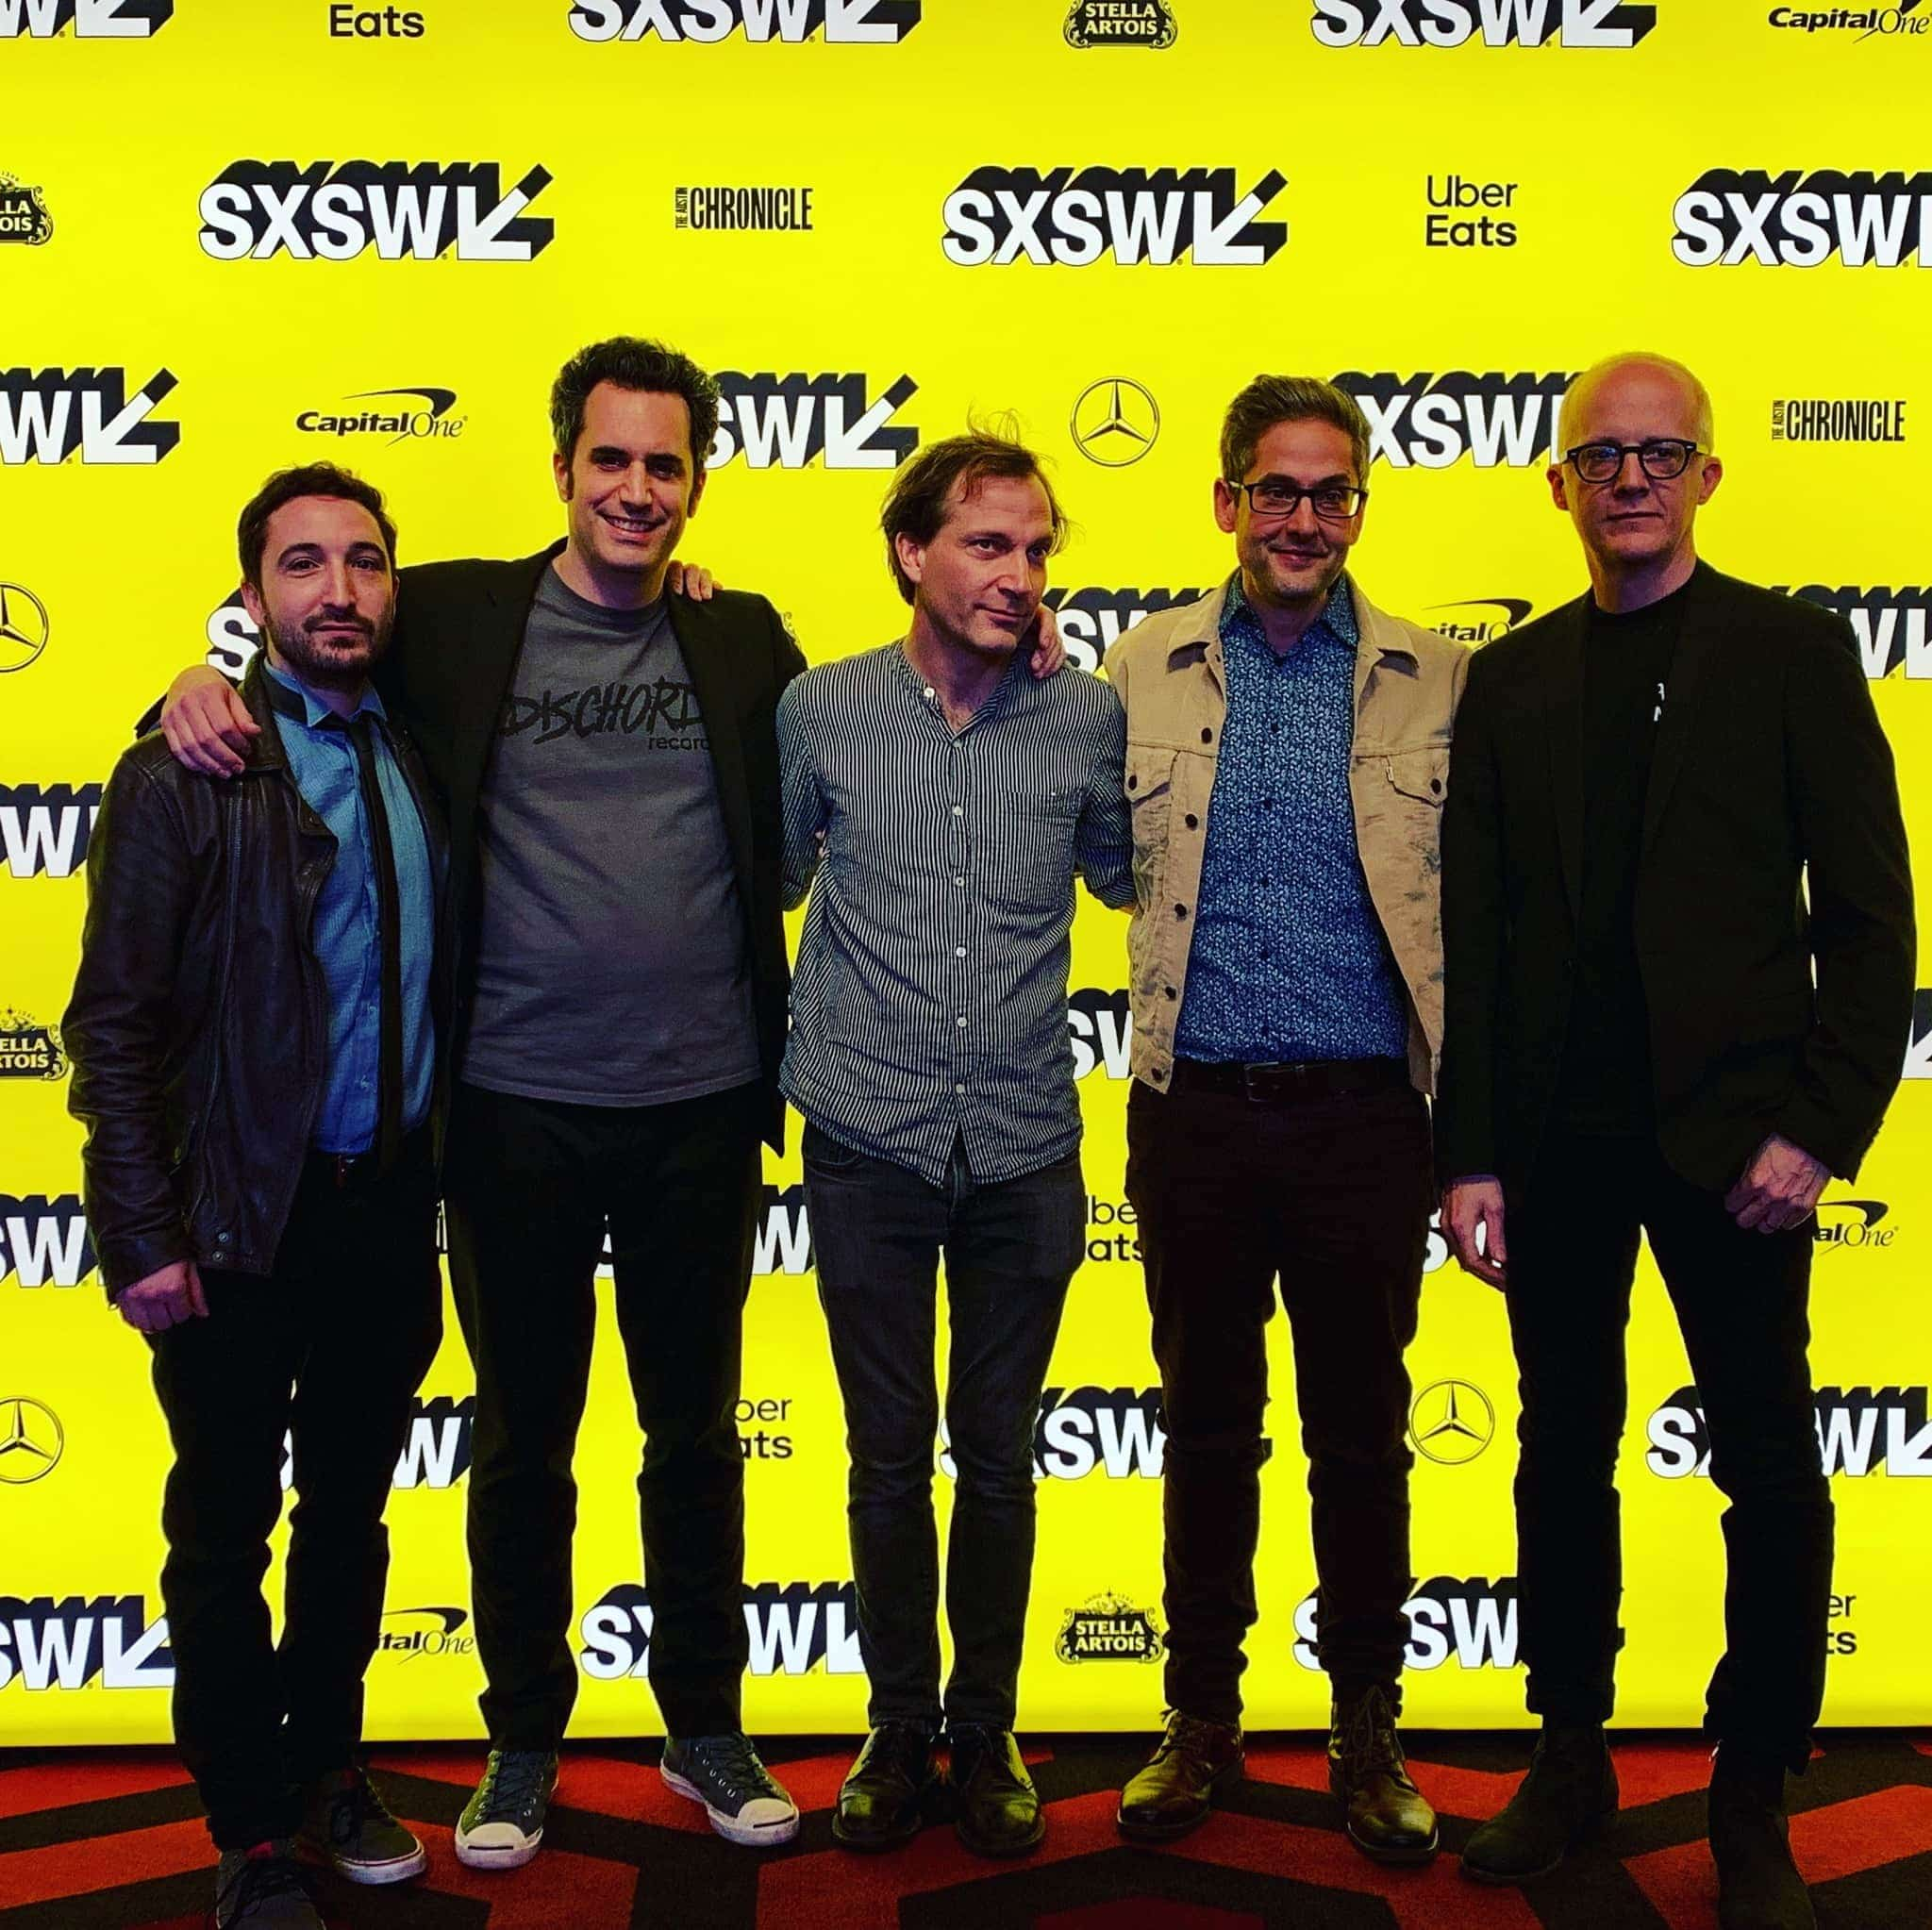 L – R SX photo: Ian Jacobs (Producer/Editor), Eric Mahoney (Director/Producer), John Schmersal (Brainiac, Guitar), Tyler Trent (Brainiac, Drums), Juan Monasterio (Brainiac, Bass)